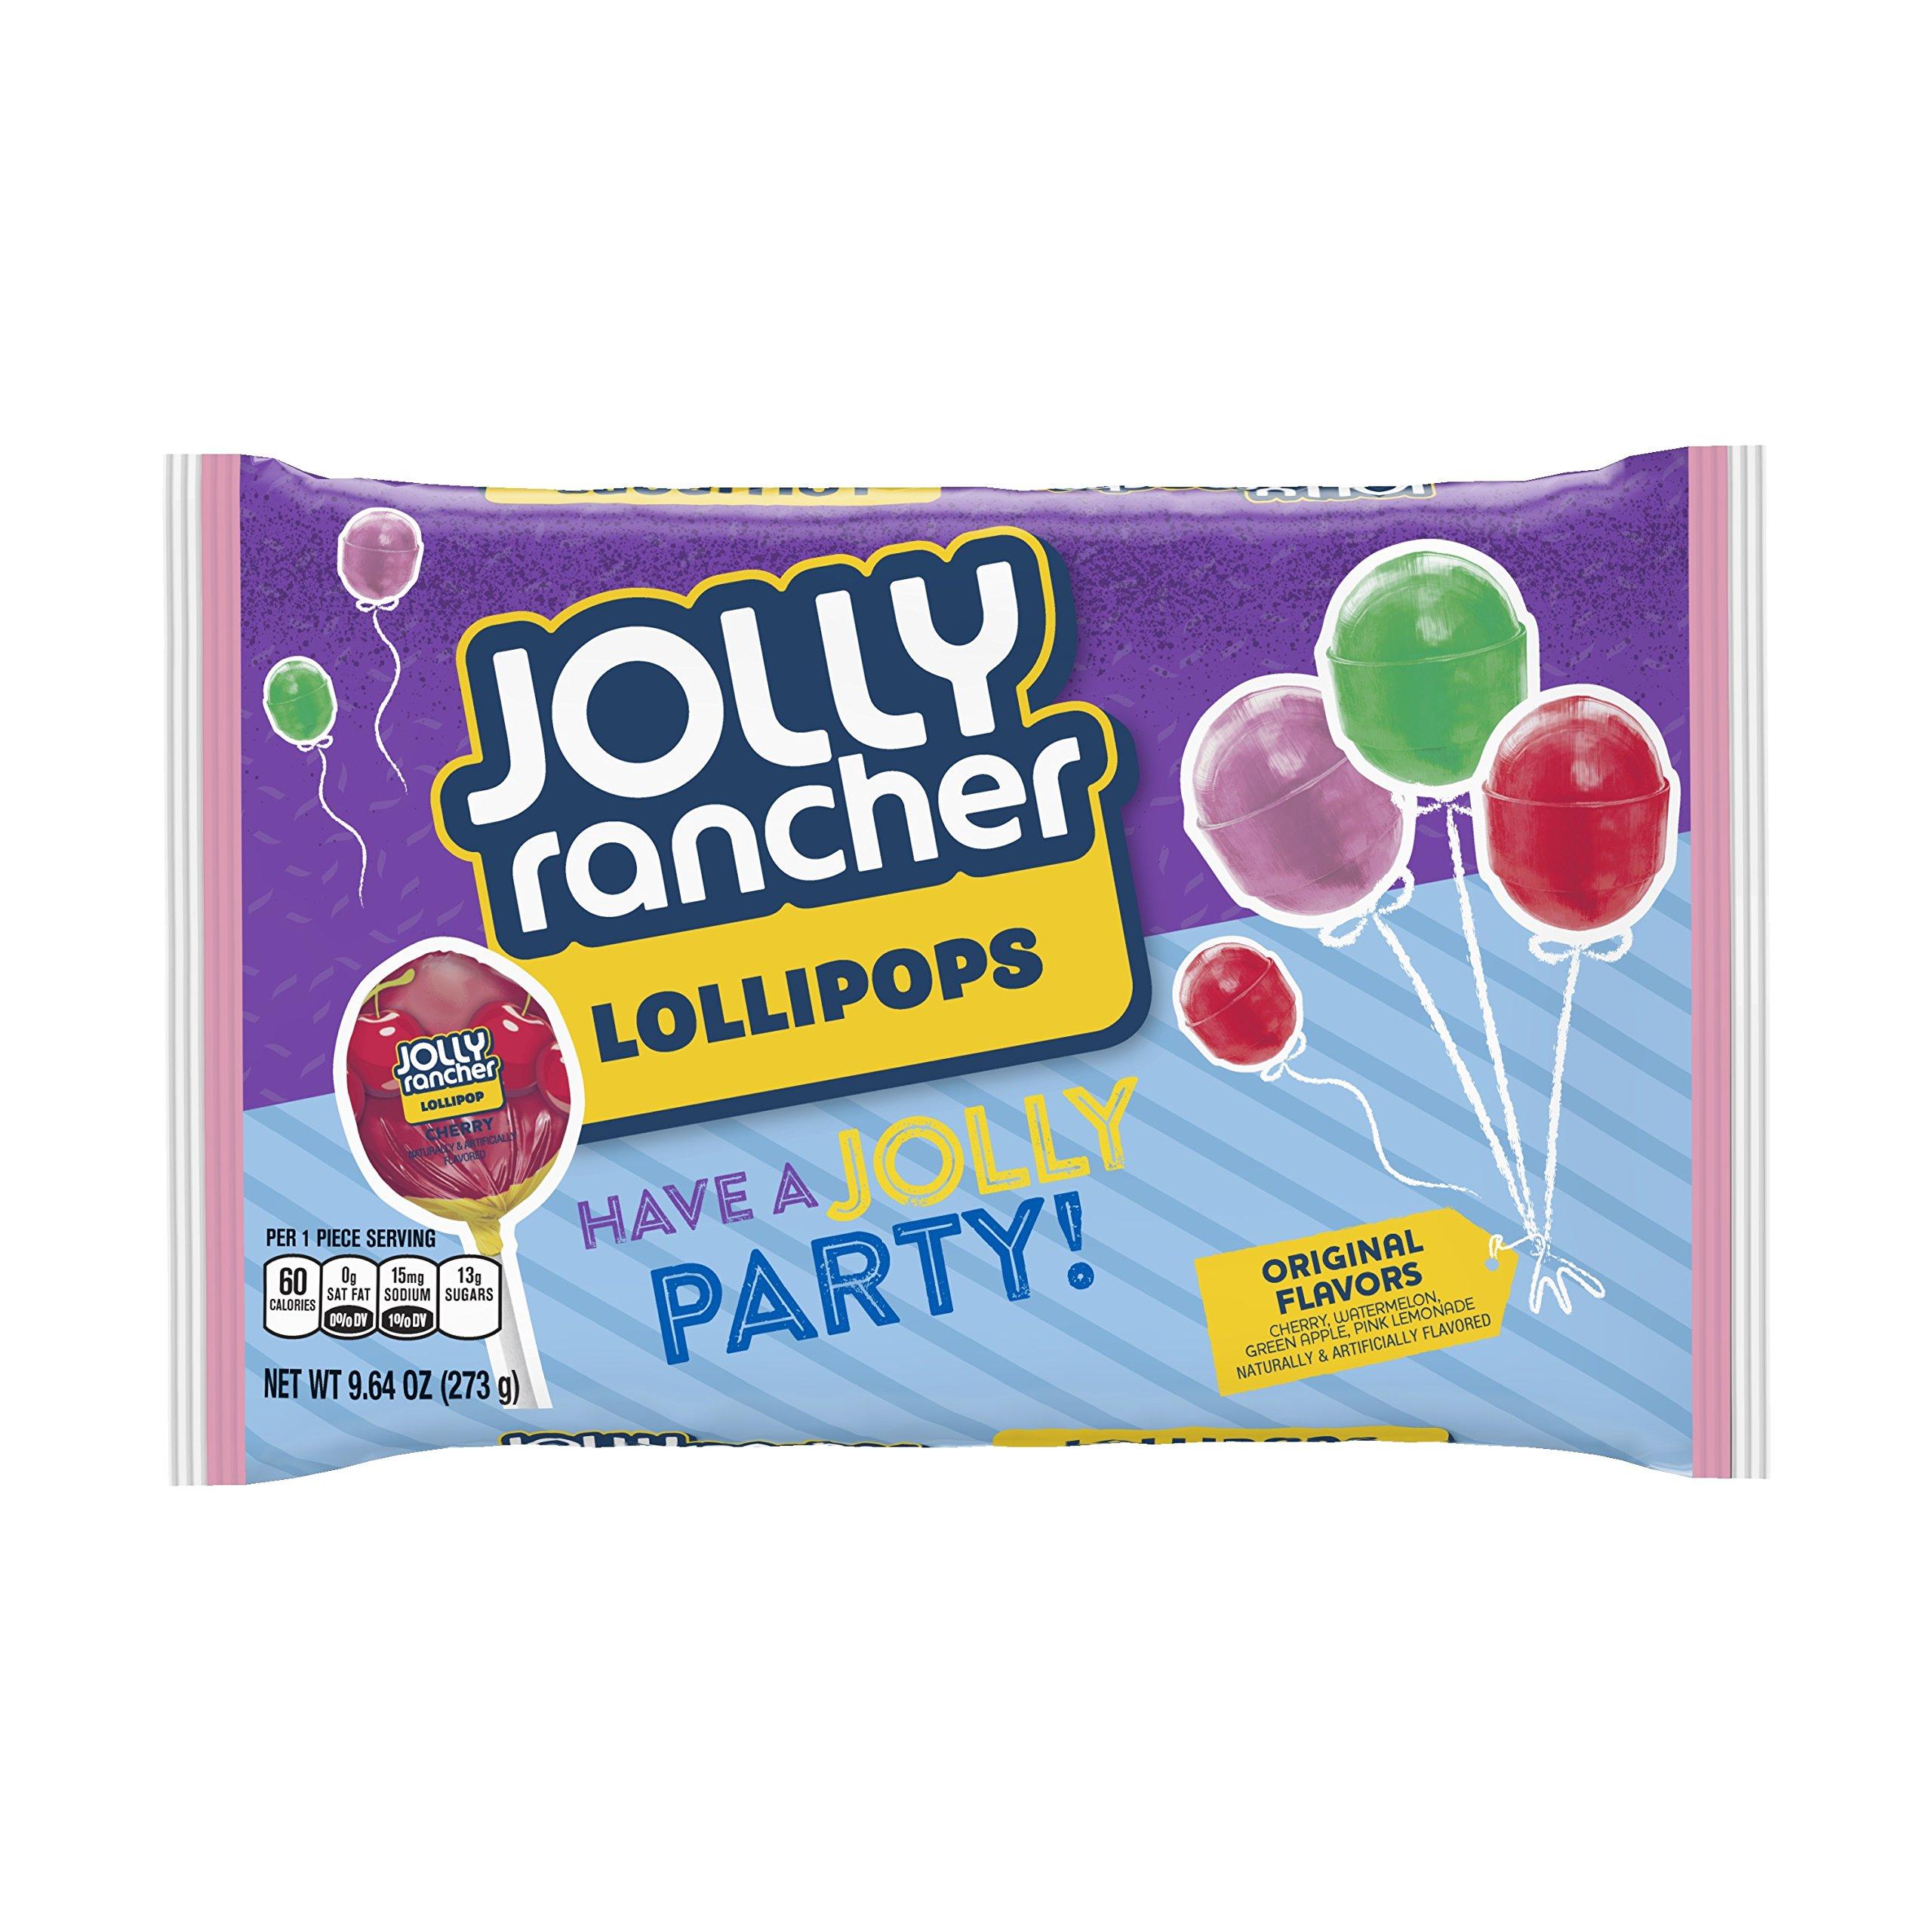 JOLLY RANCHER Birthday Lollipops, Assorted Flavors (Cherry, Watermelon, Green Apple, Pink Lemonade), 9.64 Ounce (Pack of 12)